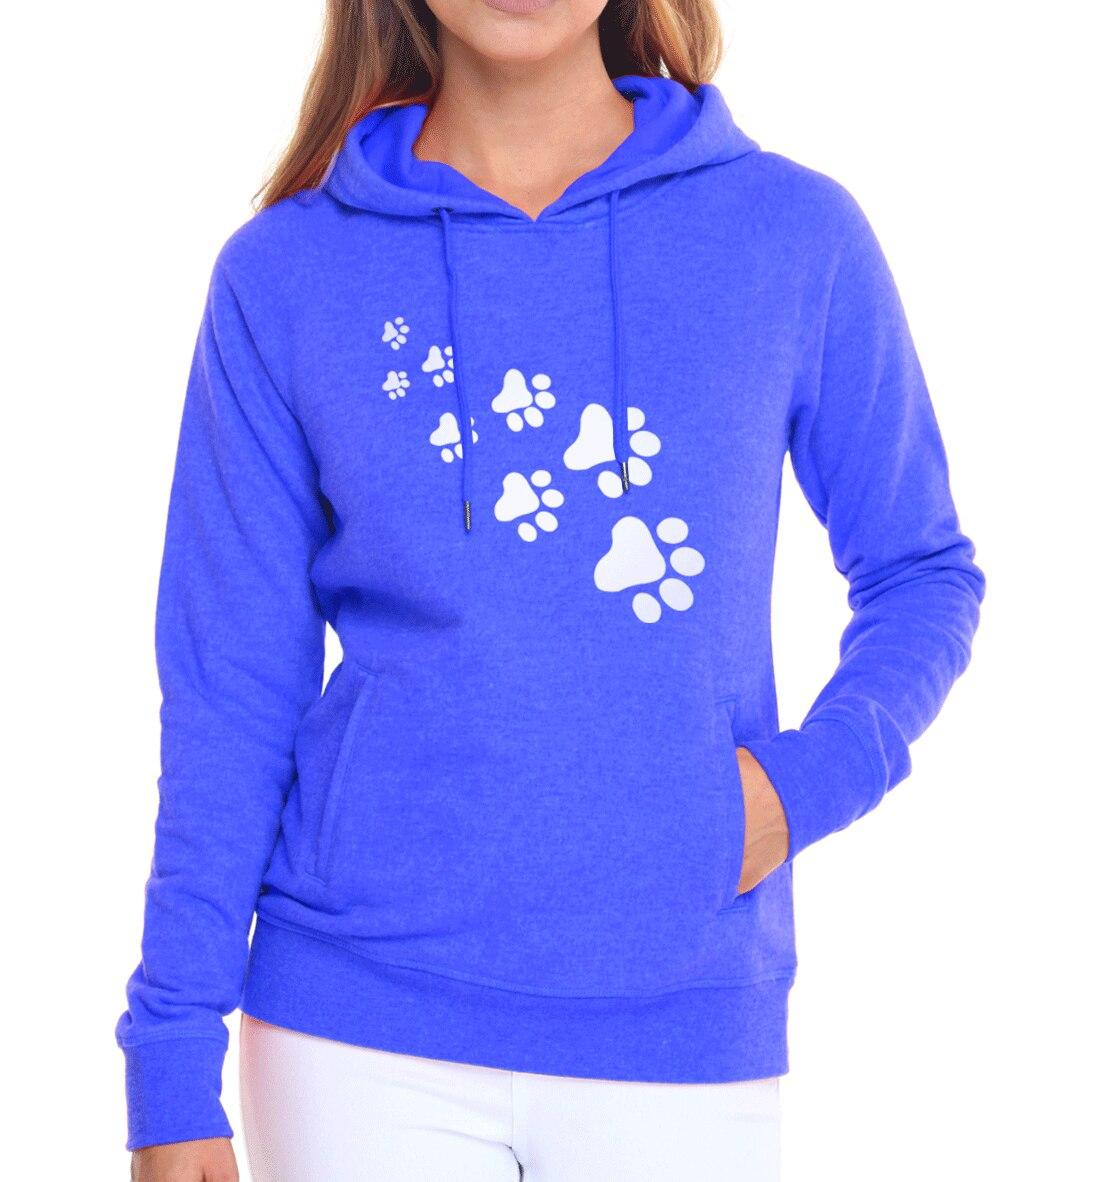 Casual fleece autumn winter sweatshirt pullovers 17 kawaii cat paws print hoodies for Women black pink brand tracksuits femme 3